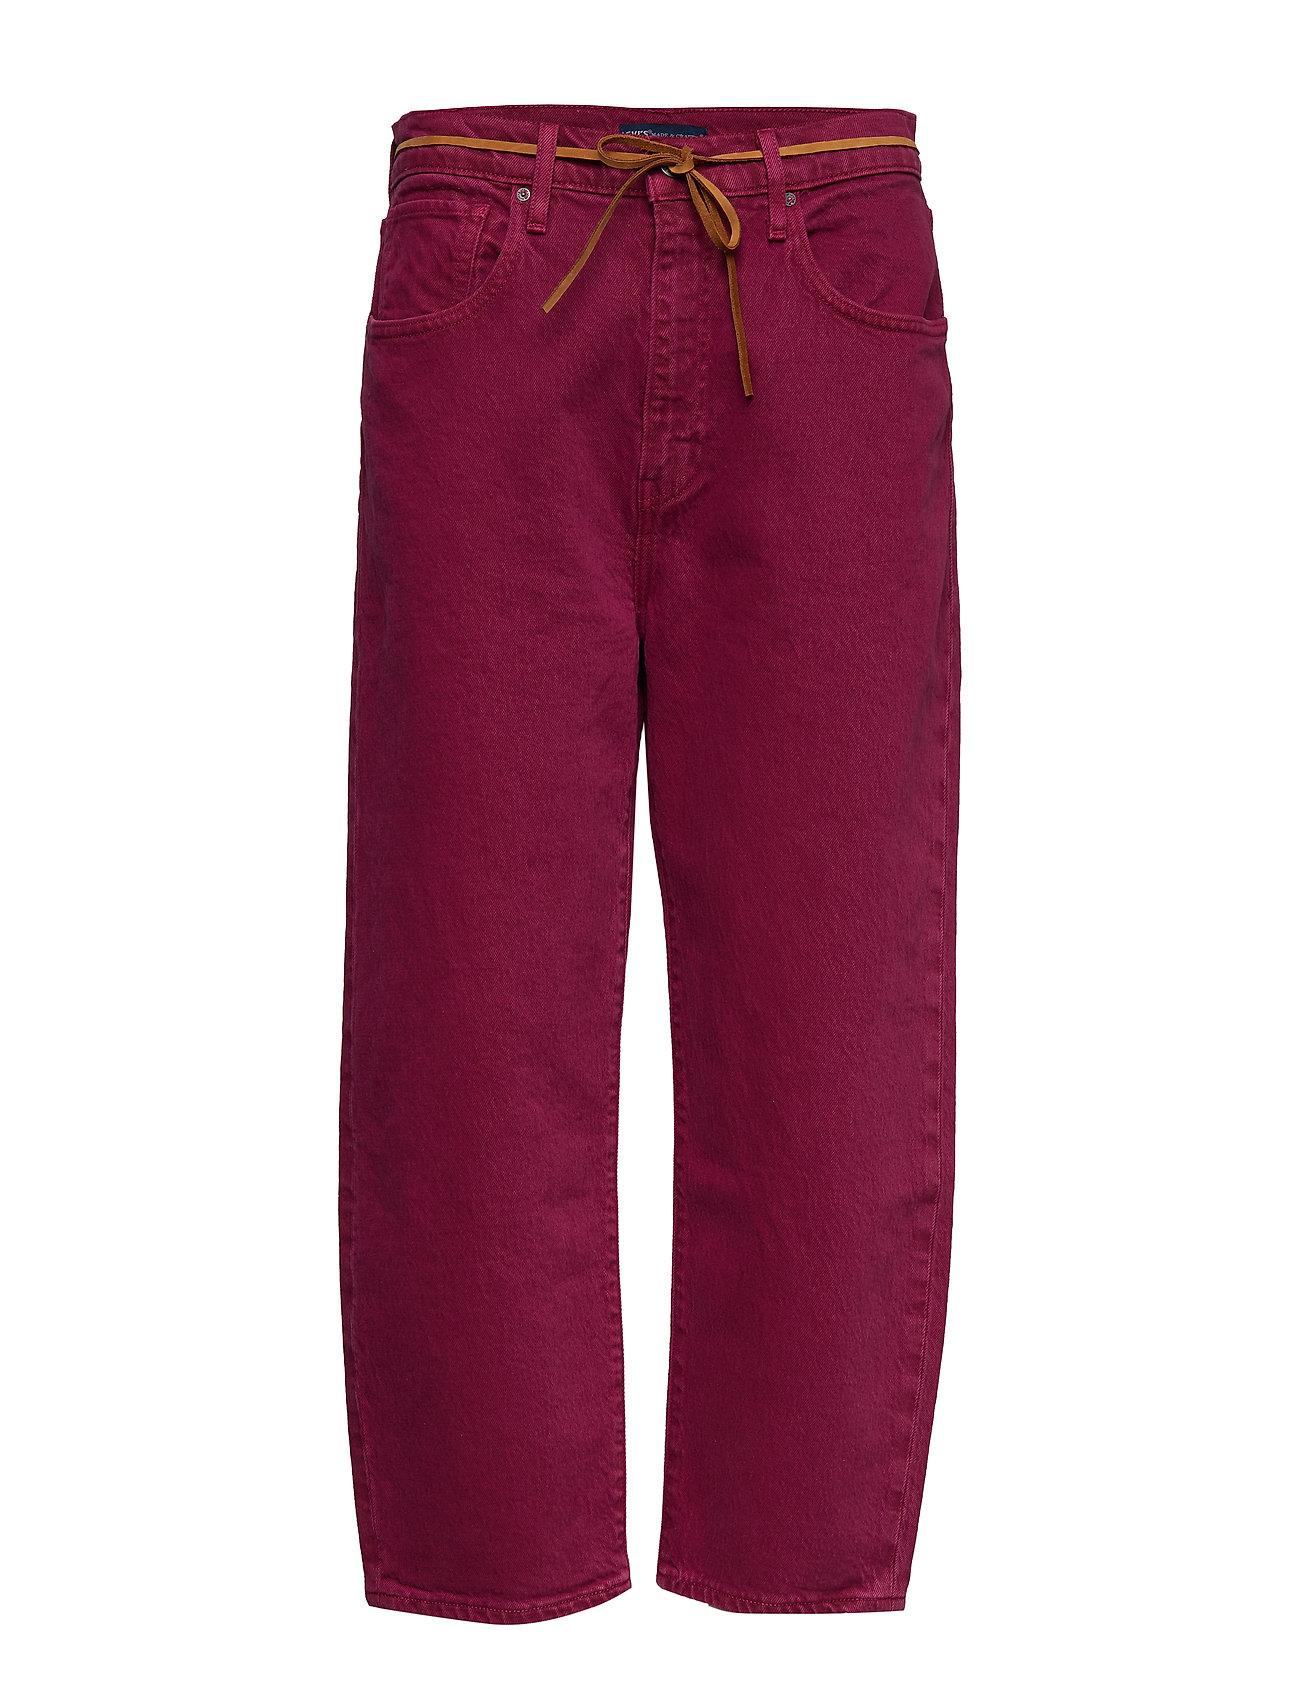 Levi's Made & Crafted LMC BARREL LMC SENORITA PINK - REDS